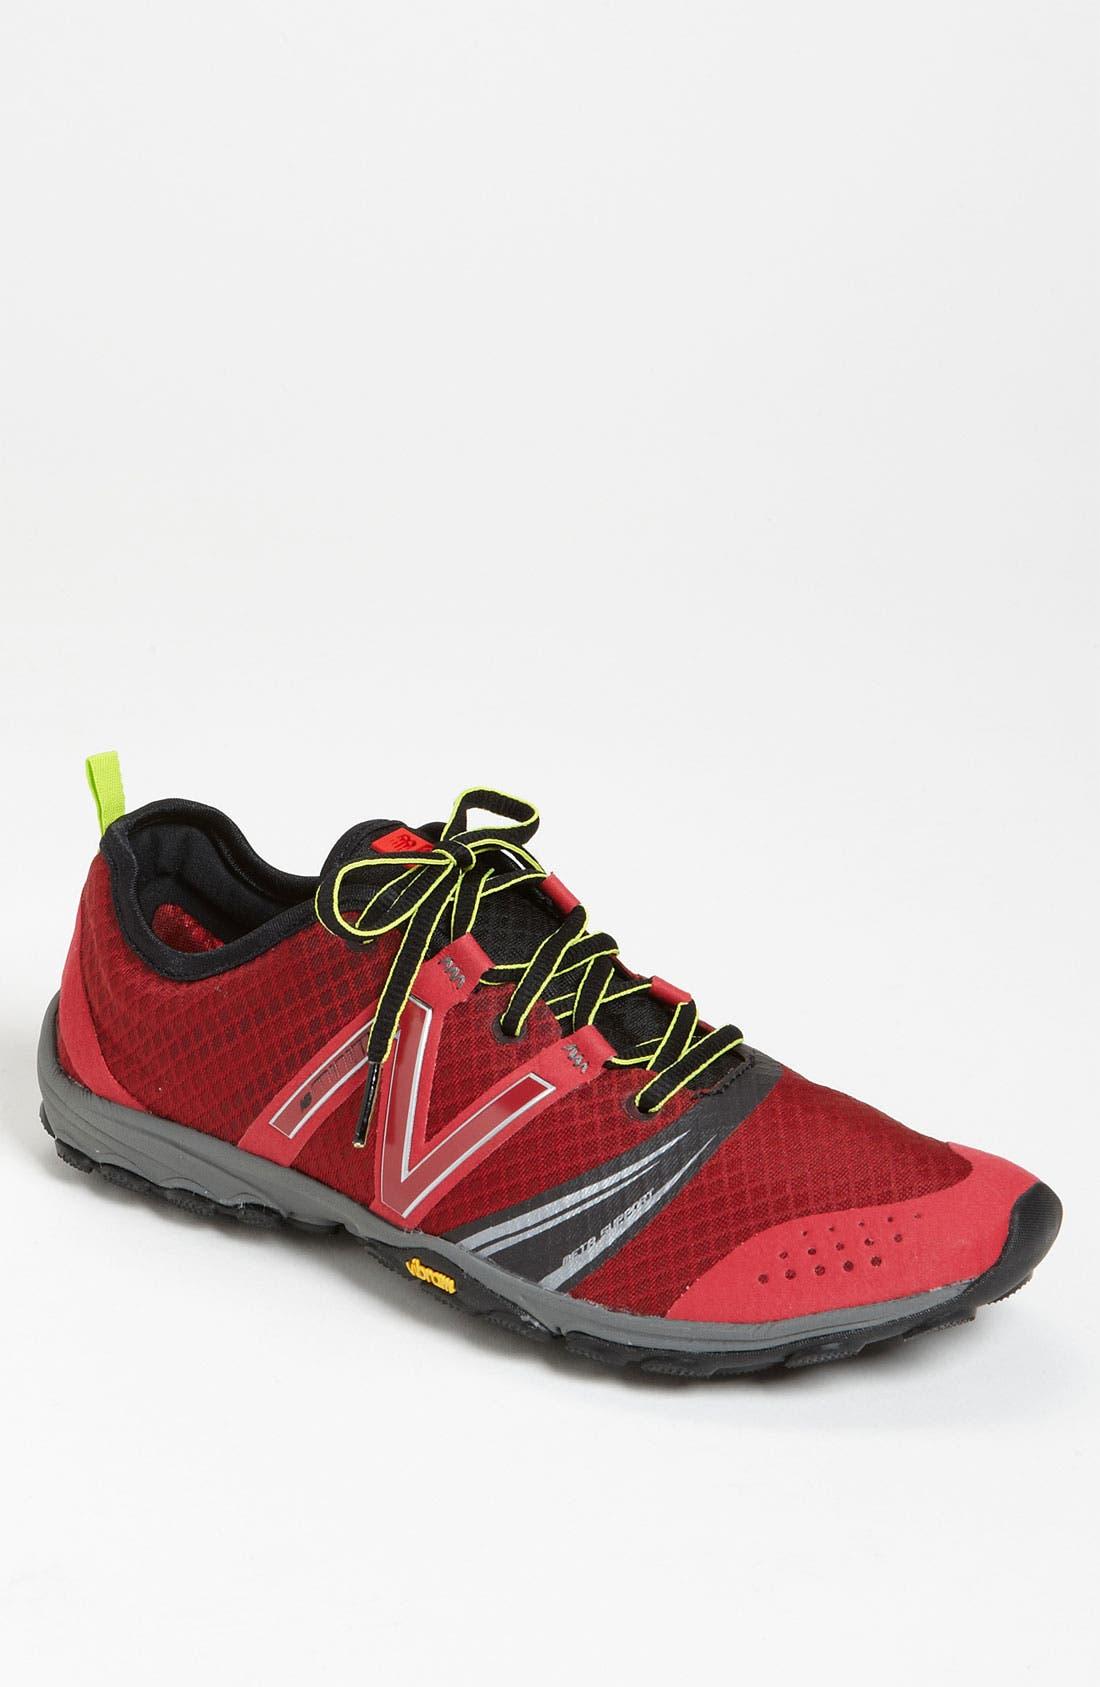 Main Image - New Balance 'Minimus' Trail Running Shoe (Men)